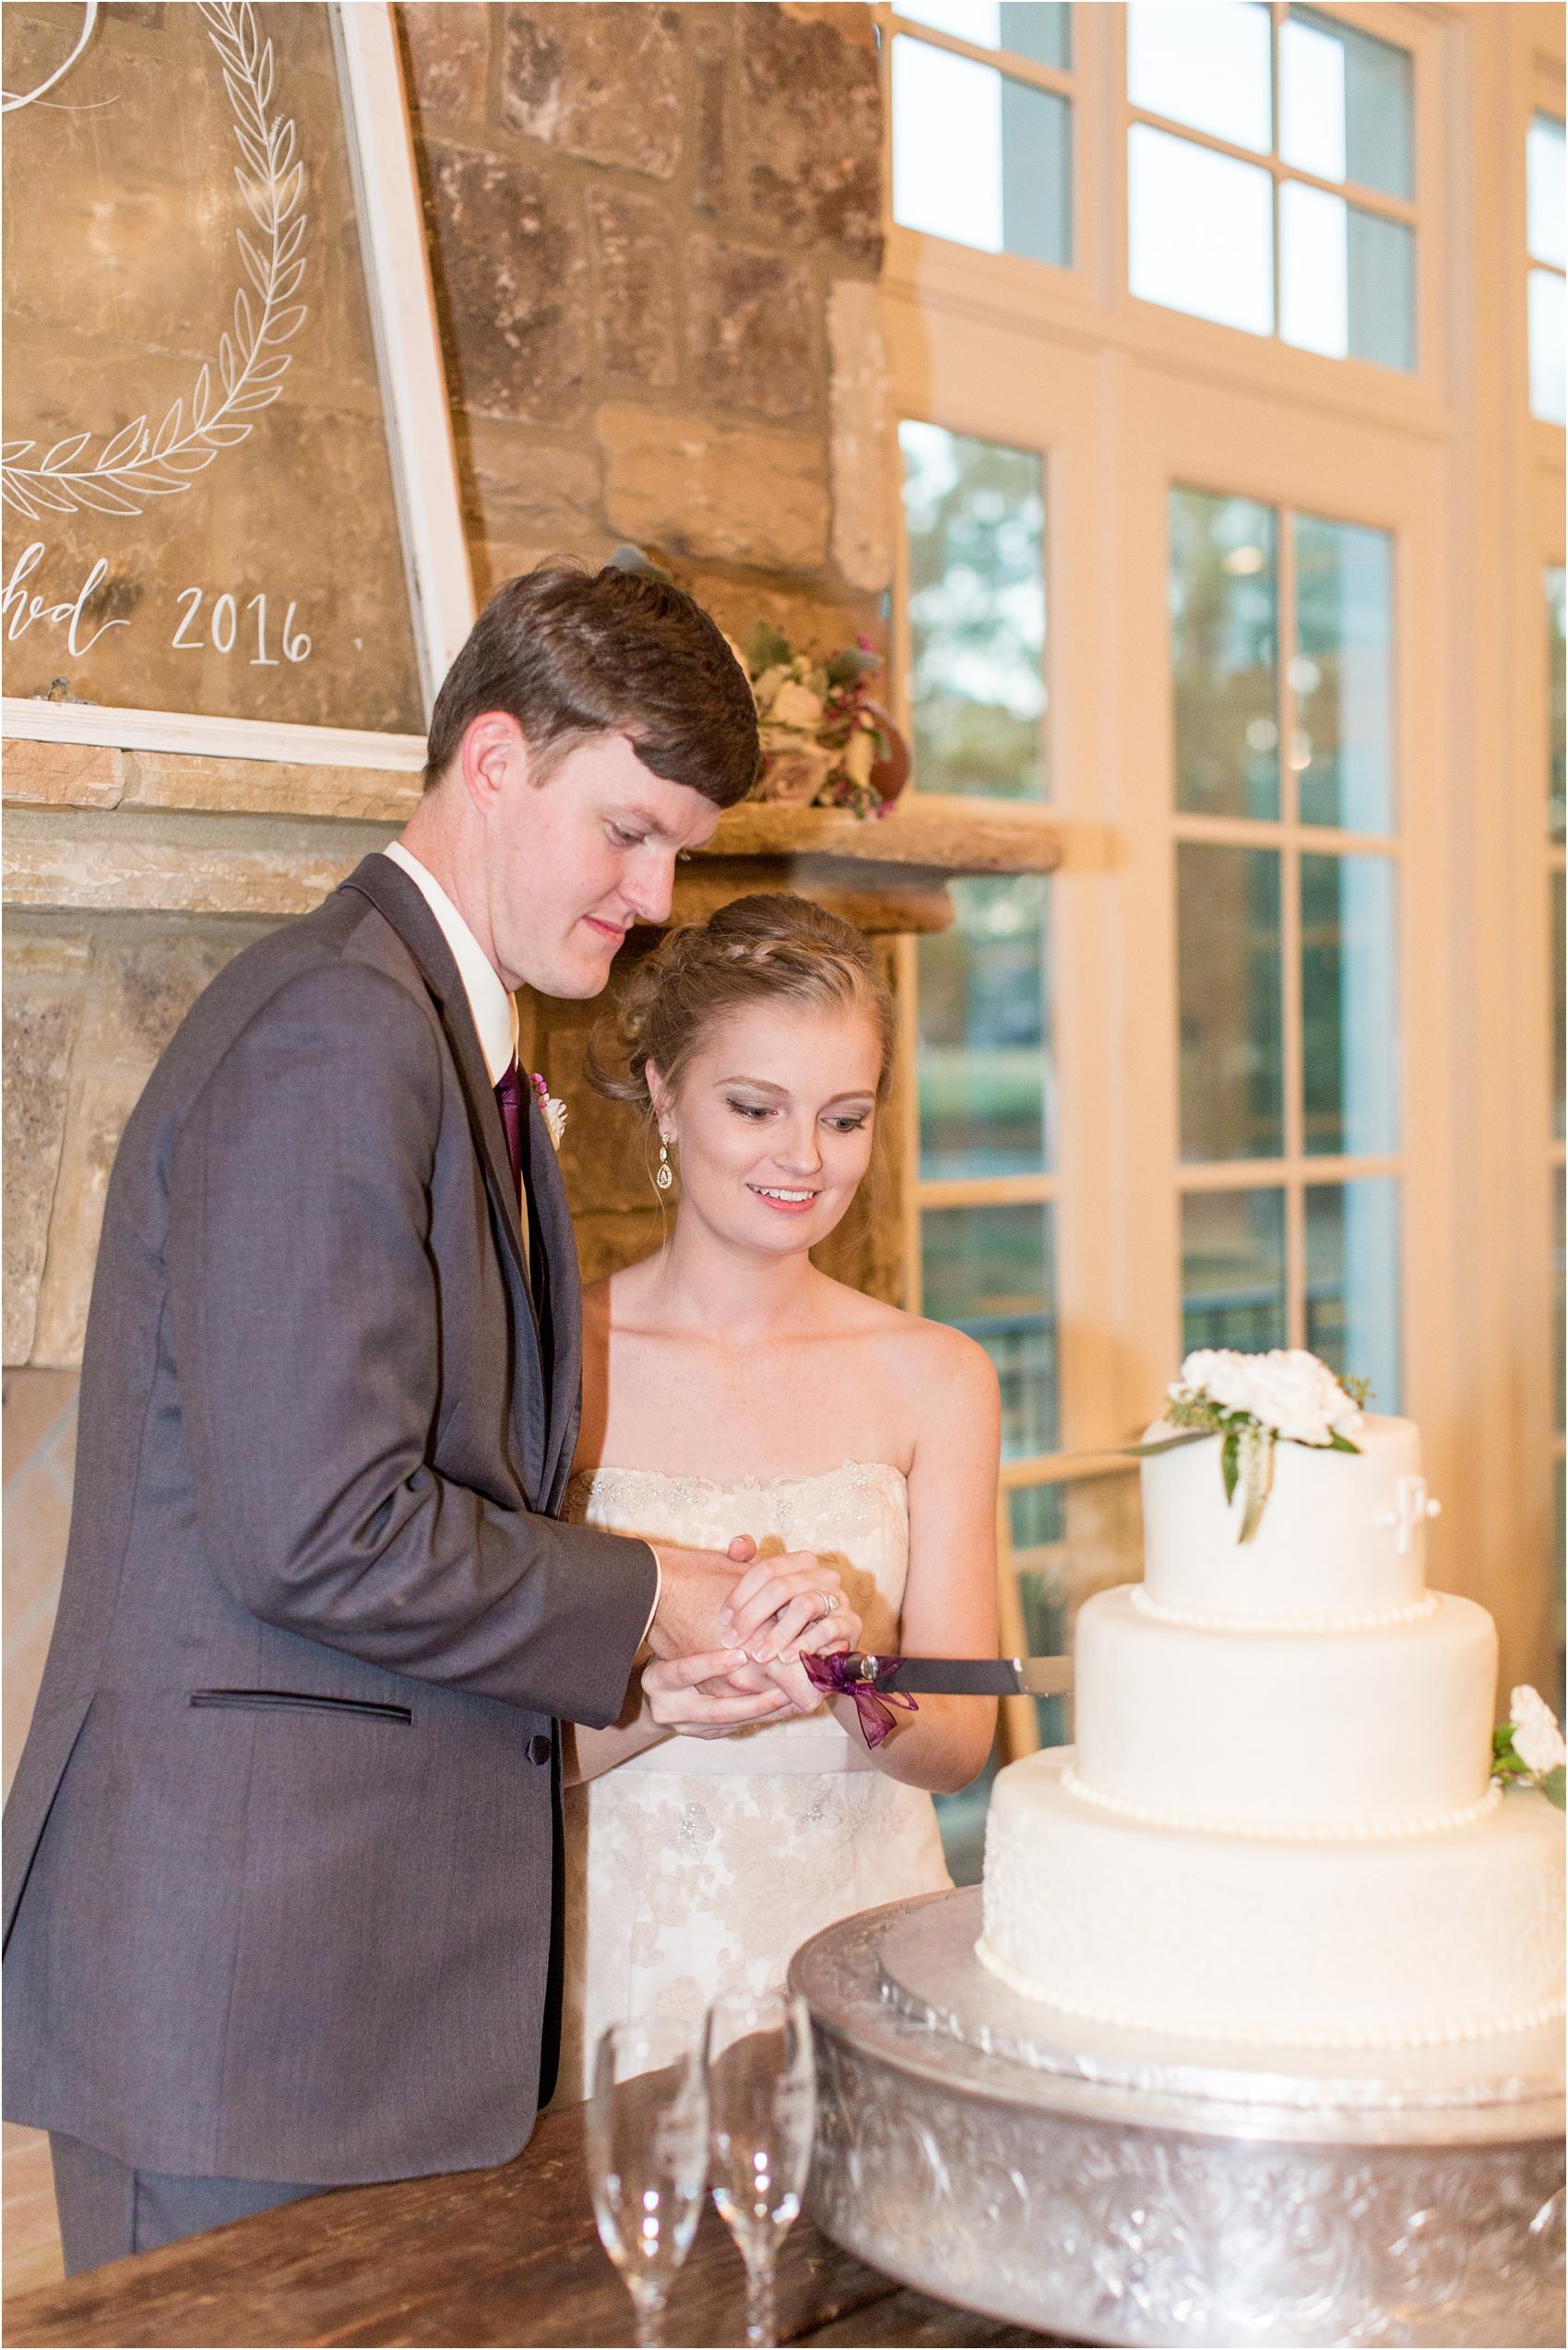 Savannah Eve Photography- Perkins Wedding- Blog-40.jpg